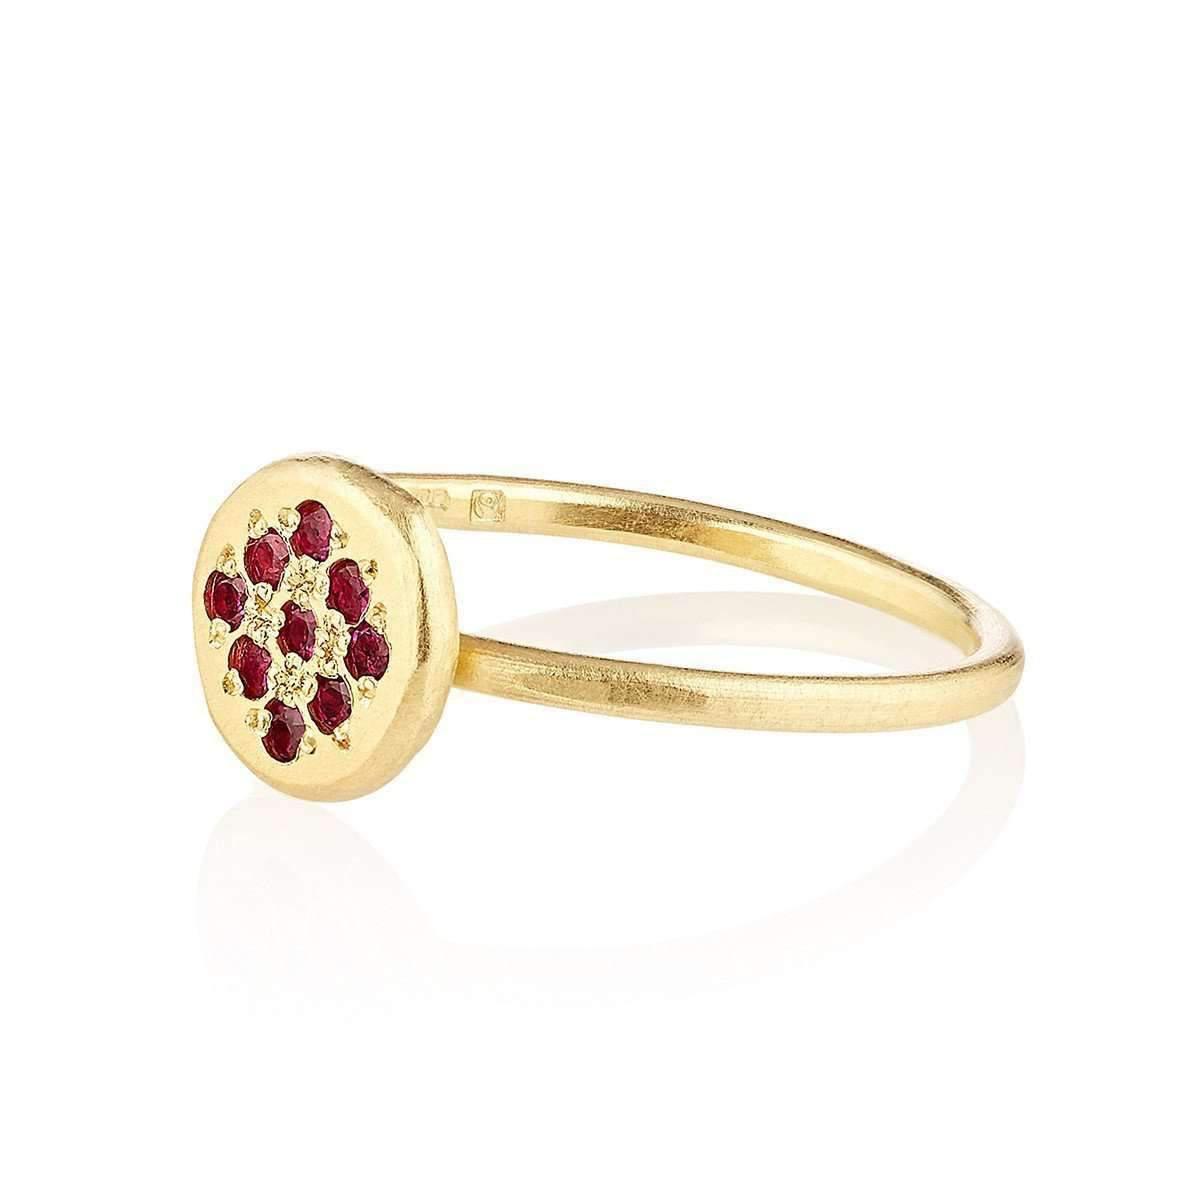 Shakti Ellenwood 18kt Chrissie Fairtrade Gold Engagement Ring - UK L - US 5 1/2 - EU 51 3/4 VI28T